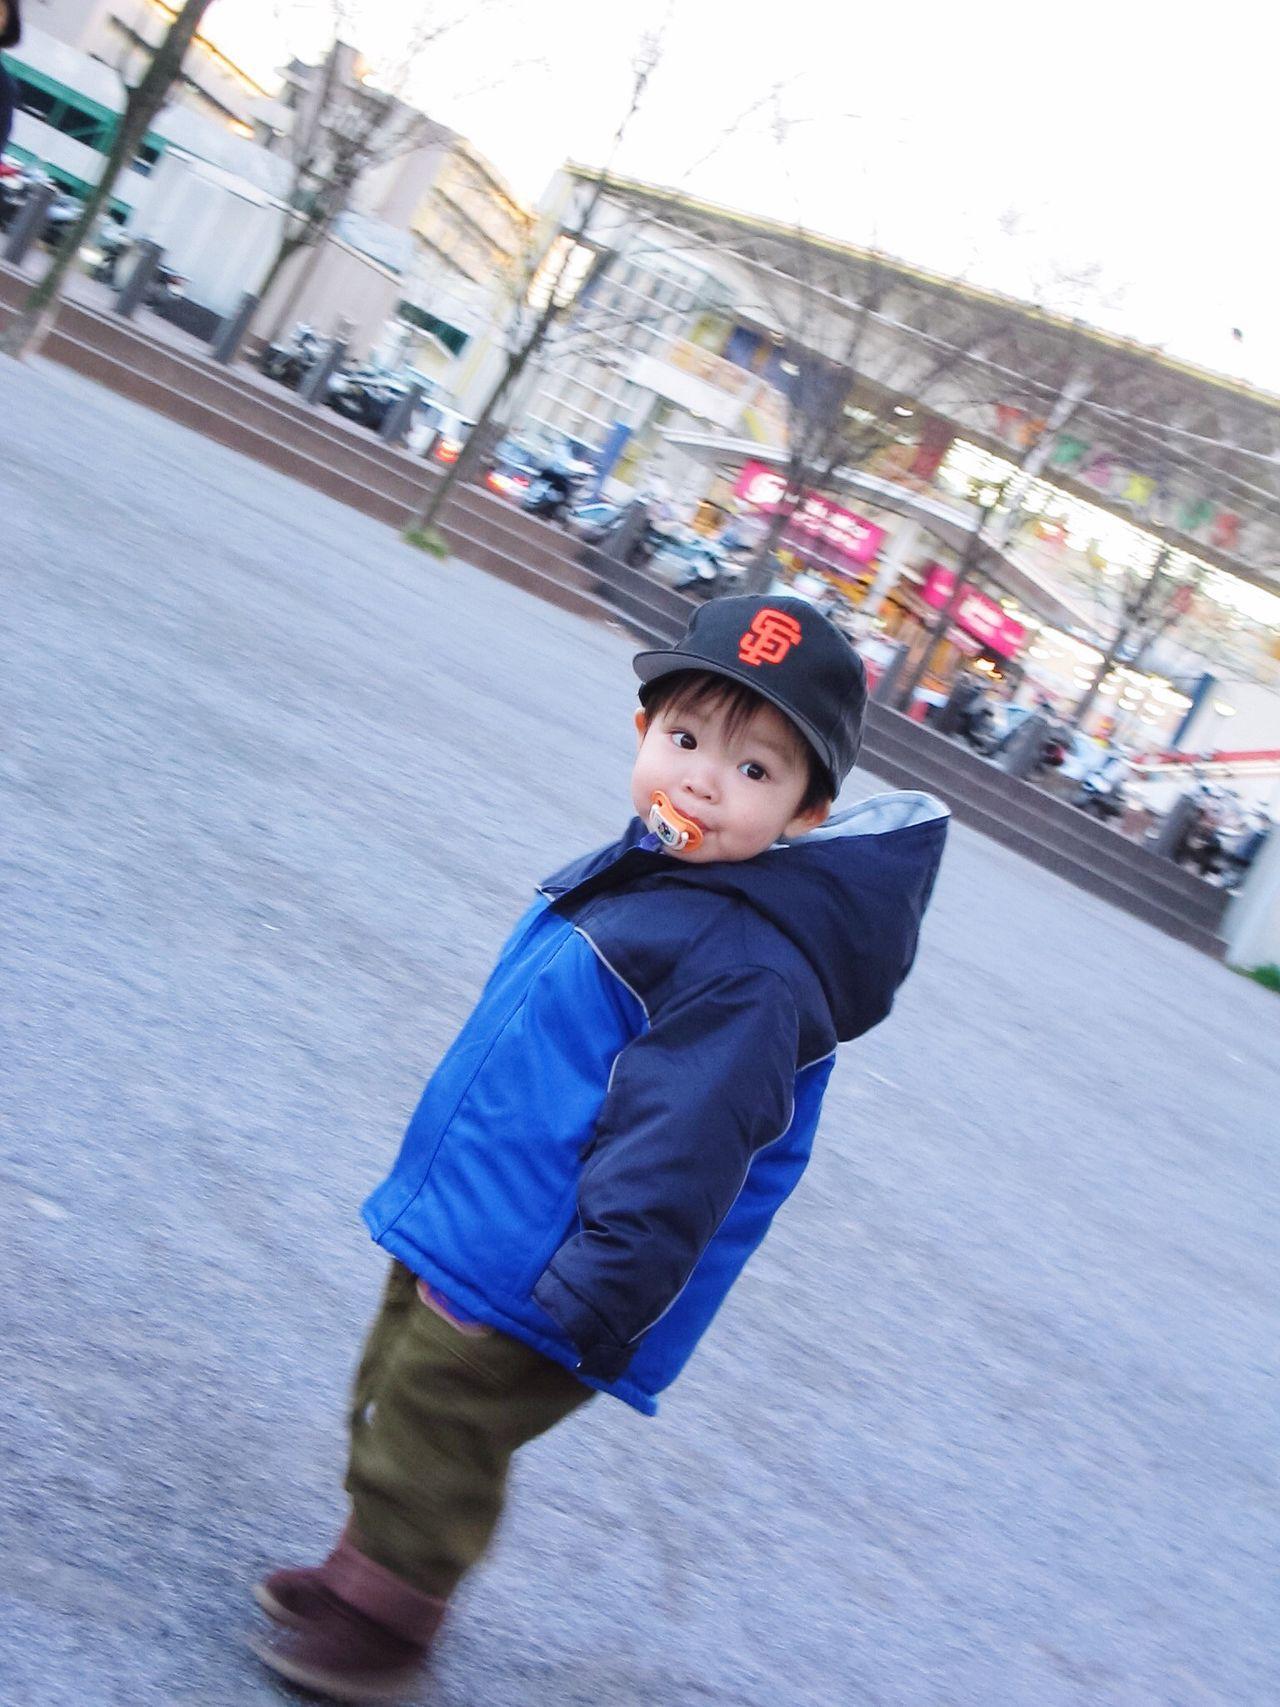 Little baseball fan Sports Fan Boy Toddler  Toddlers  Toddlerlife Pacifier Fashion Winter Wintertime Baseball Cap